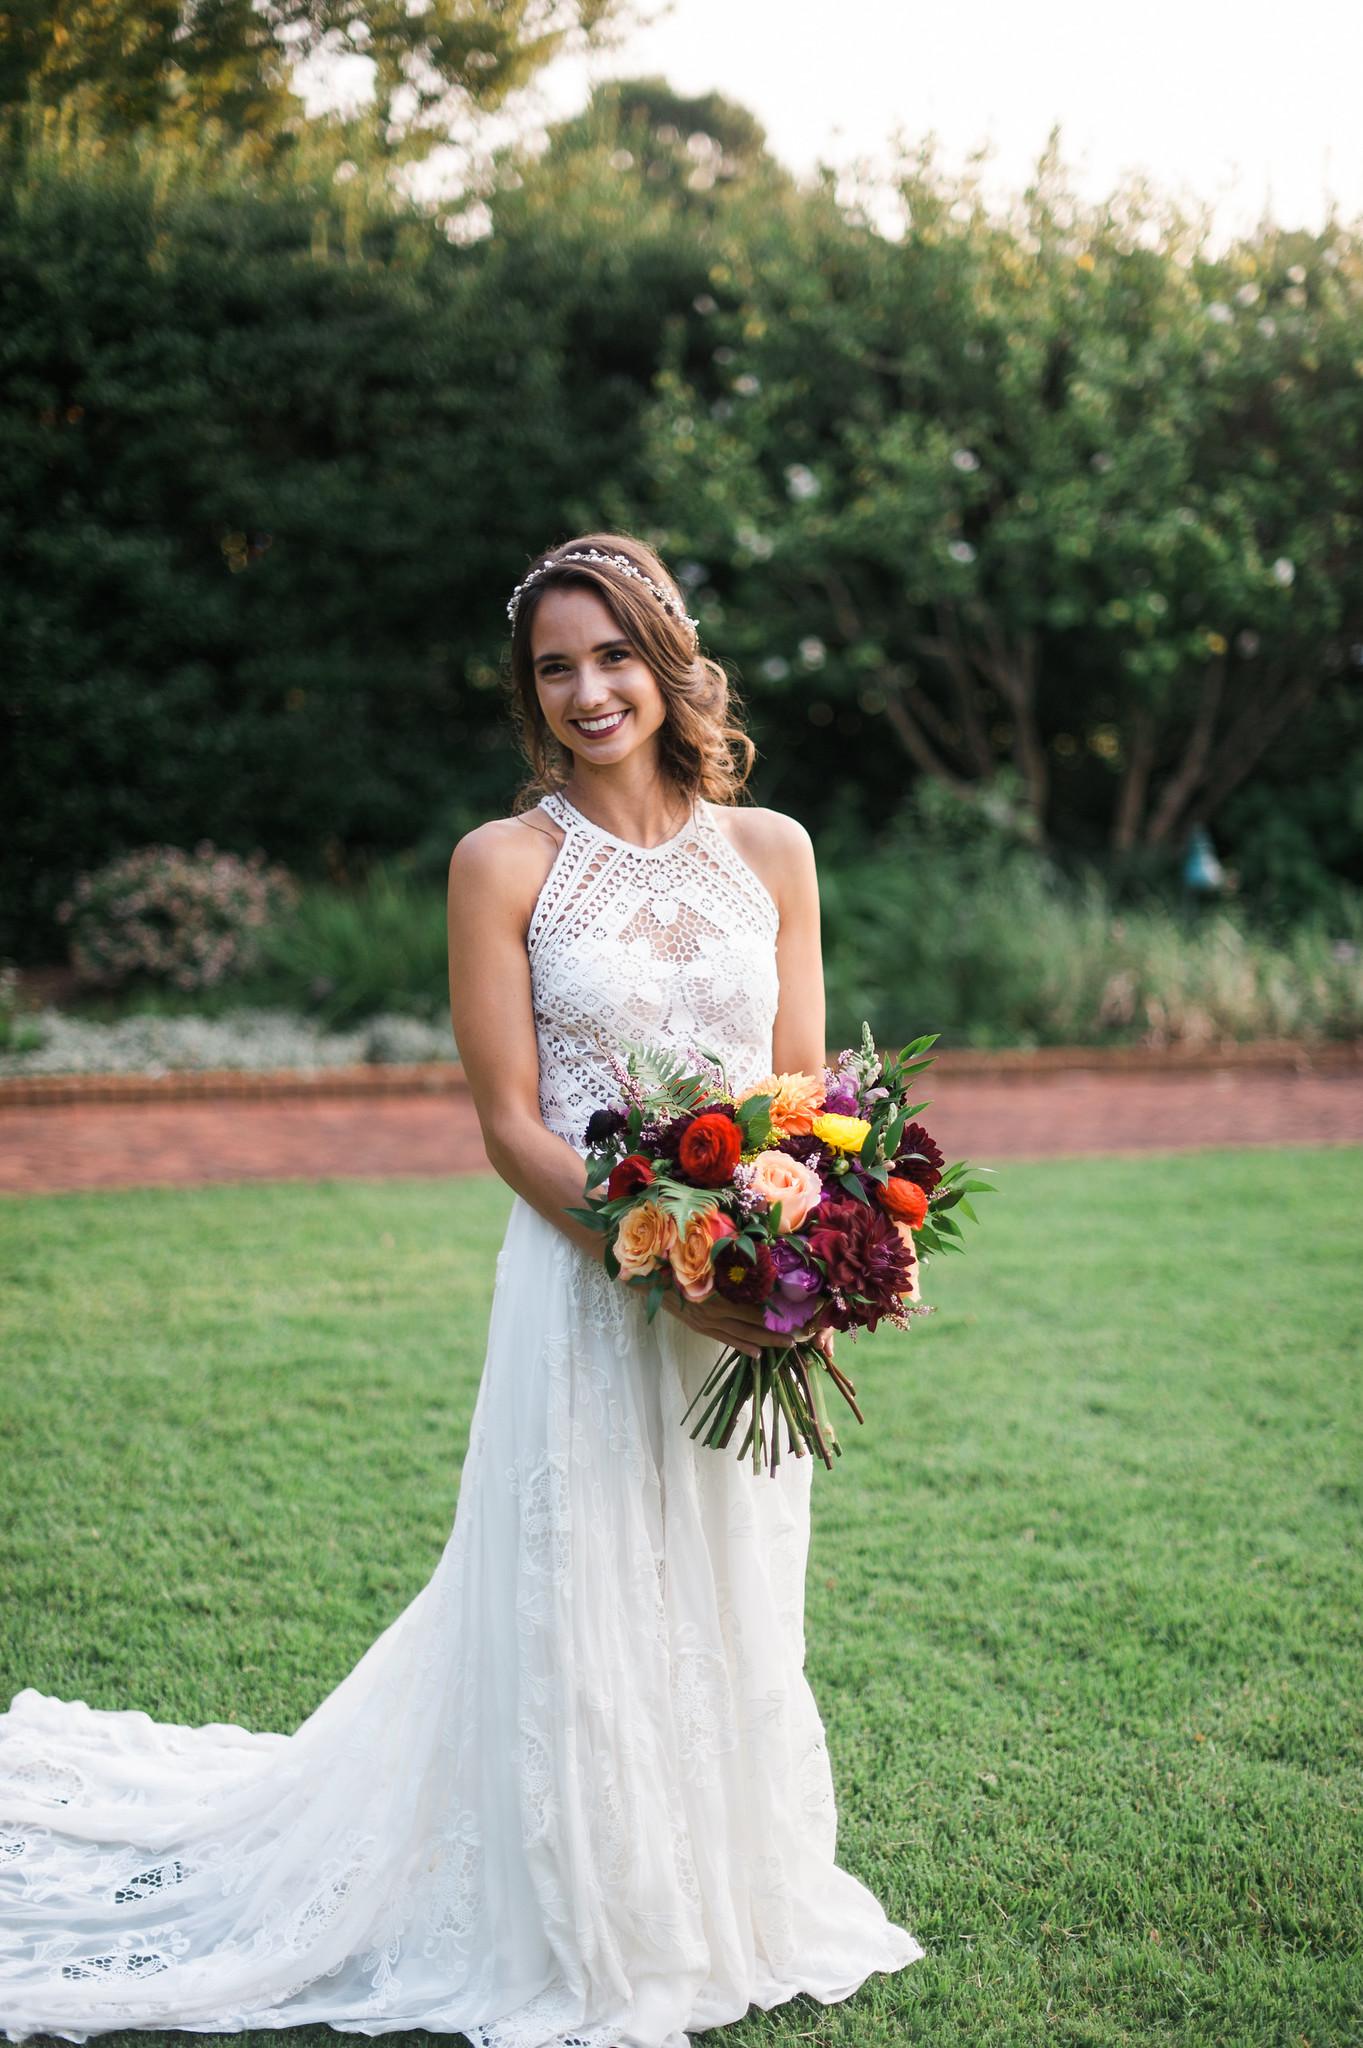 thomas-wedding-086-X4.jpg